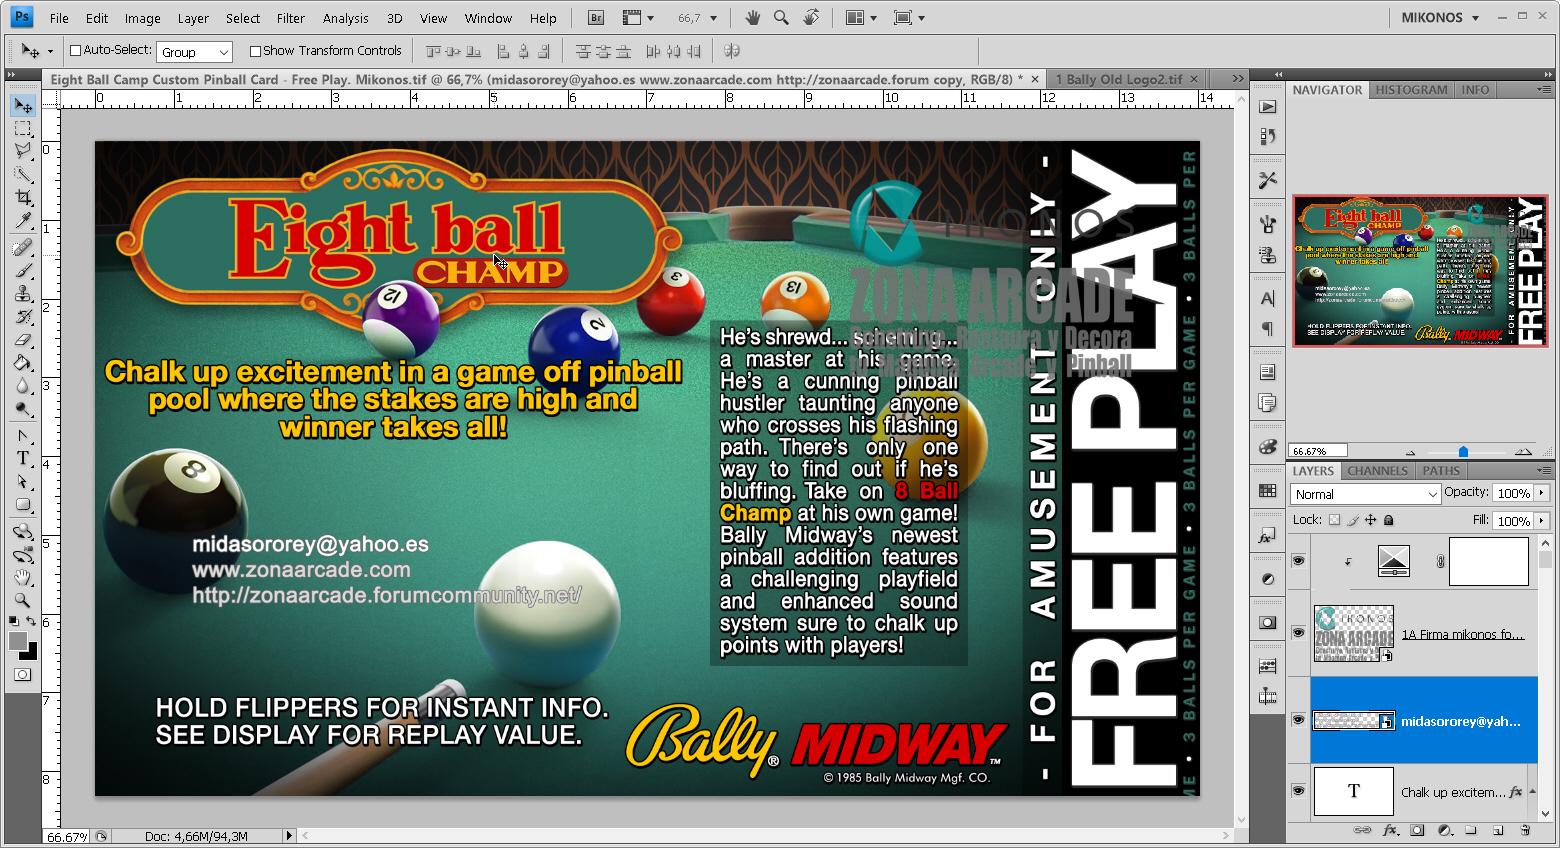 Eight Ball Champ Pinball Card Customized - Free Play. Mikonos1